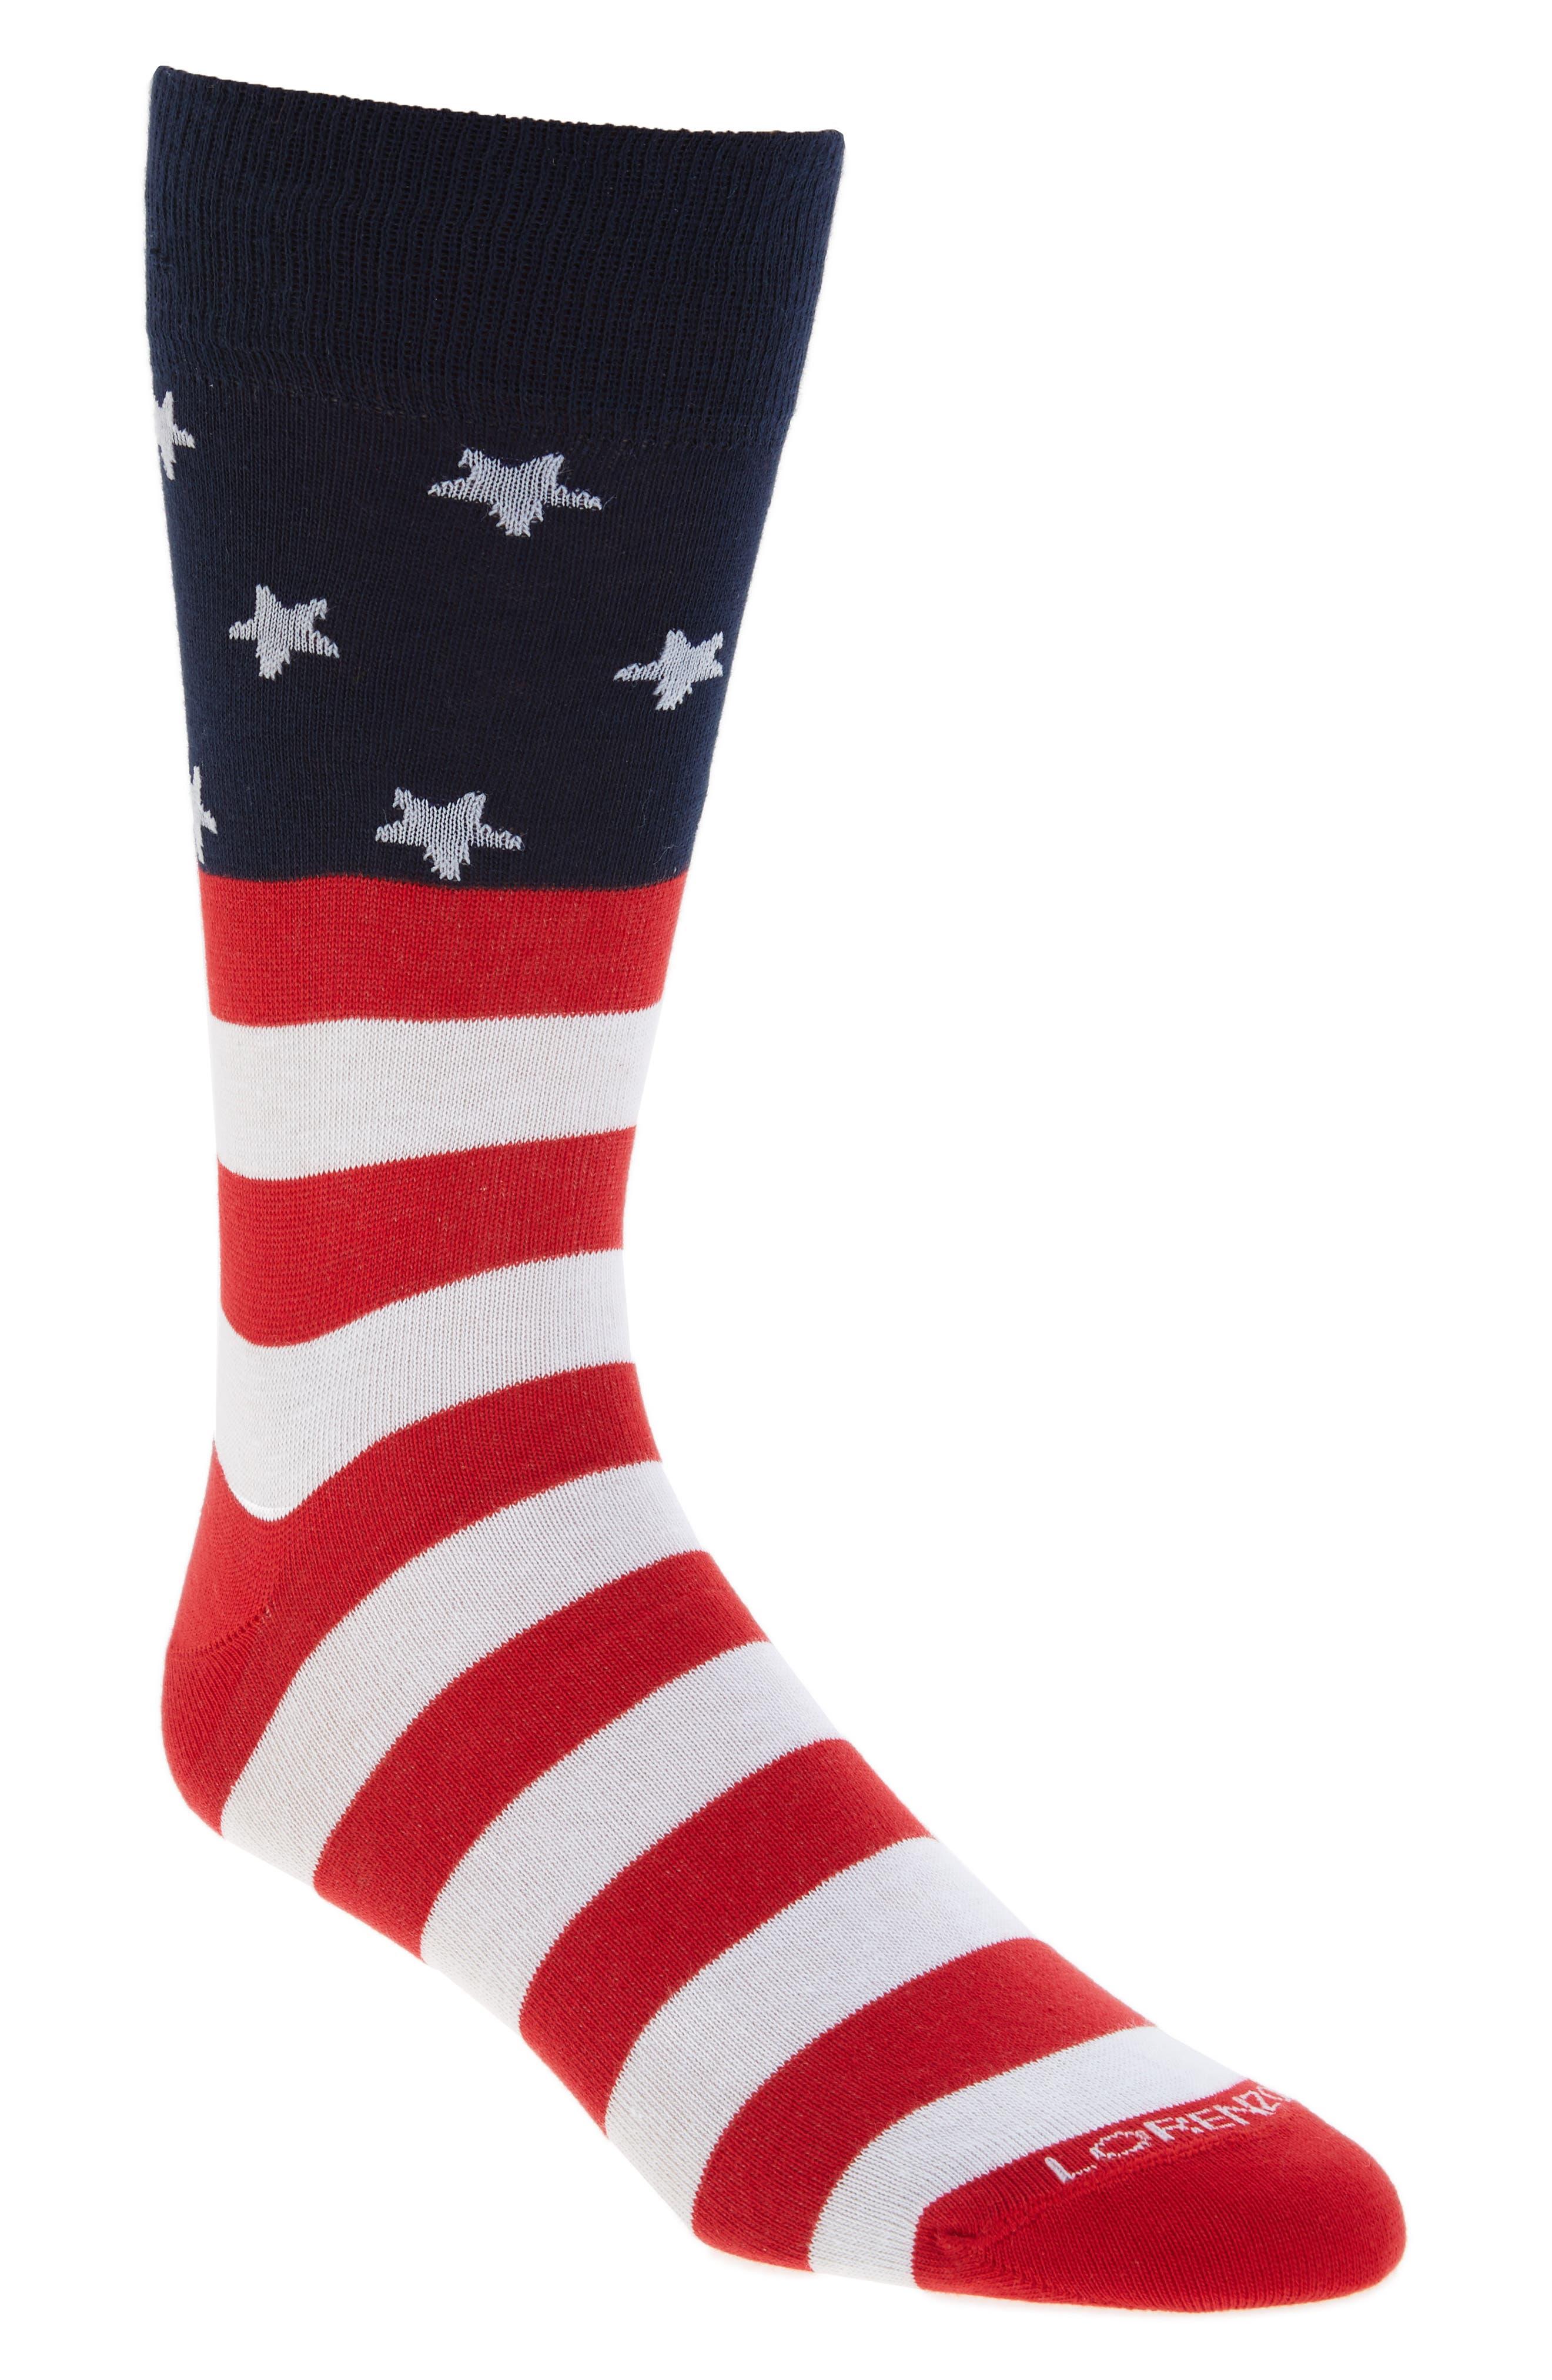 Lorenzo Uomo Americana Crew Socks (3 for $30)